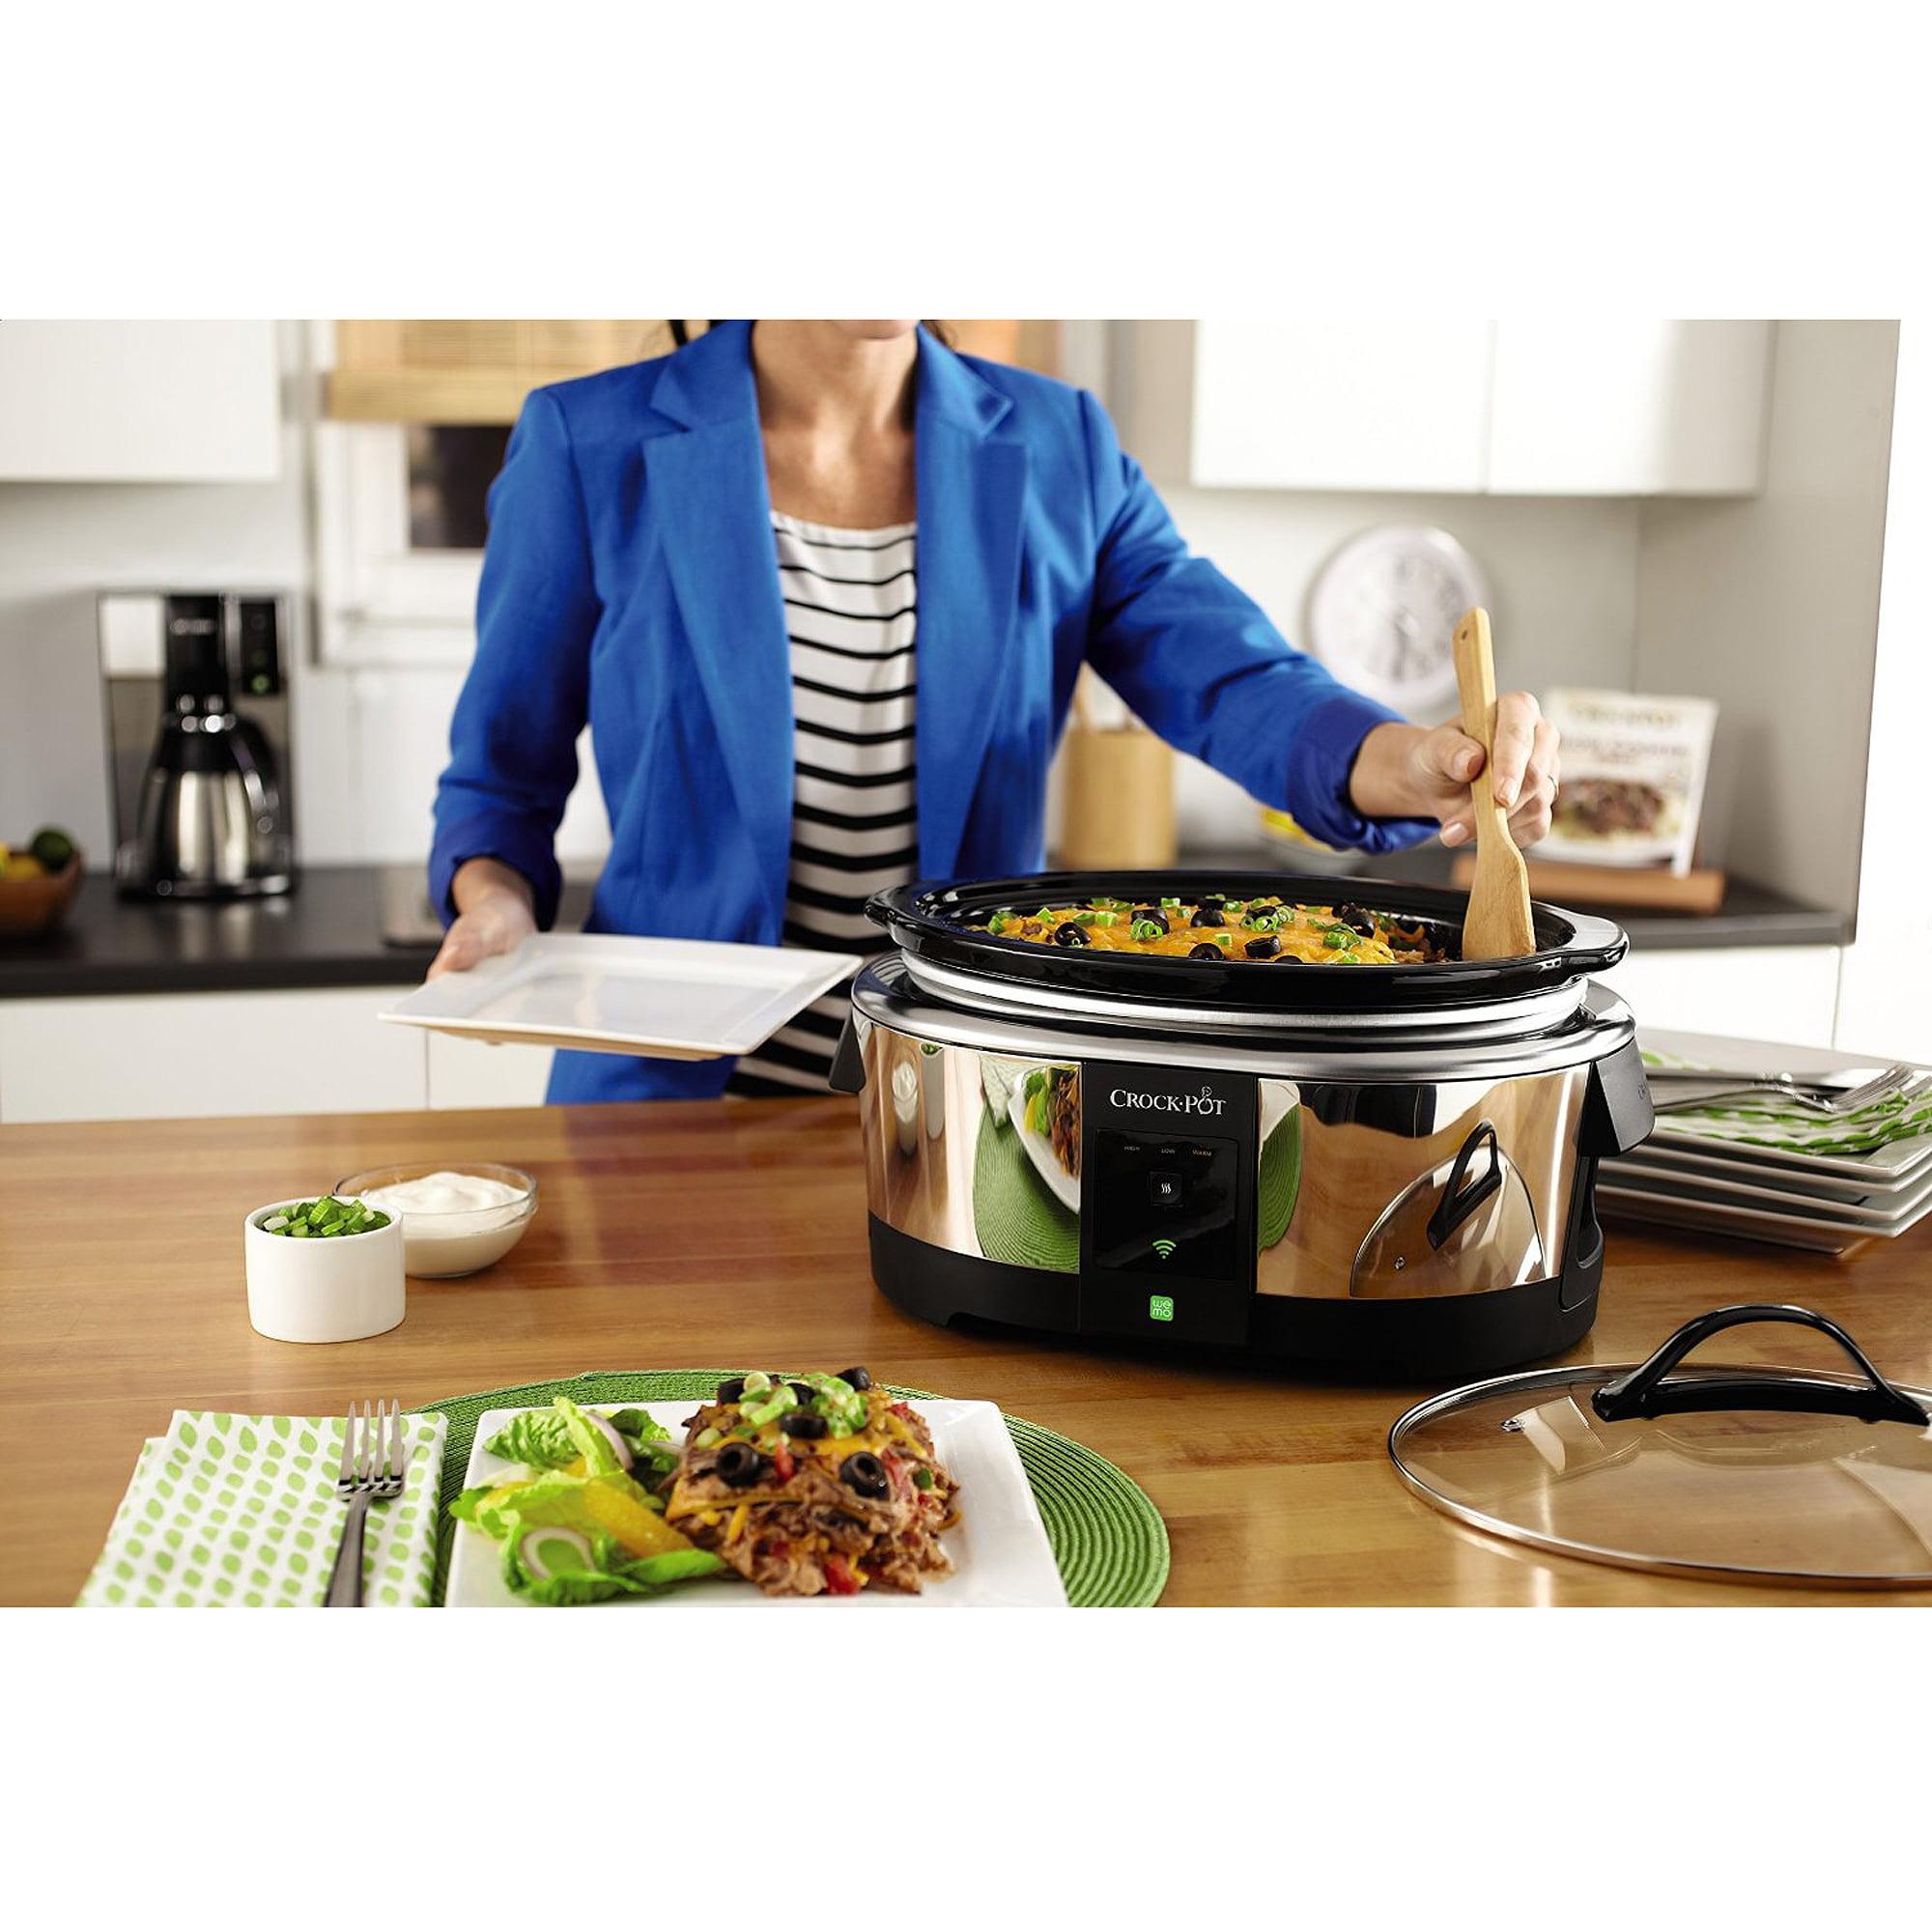 crockpot 6quart smart slow cooker enabled by wemo stainless steel sccpwm600v2 walmartcom